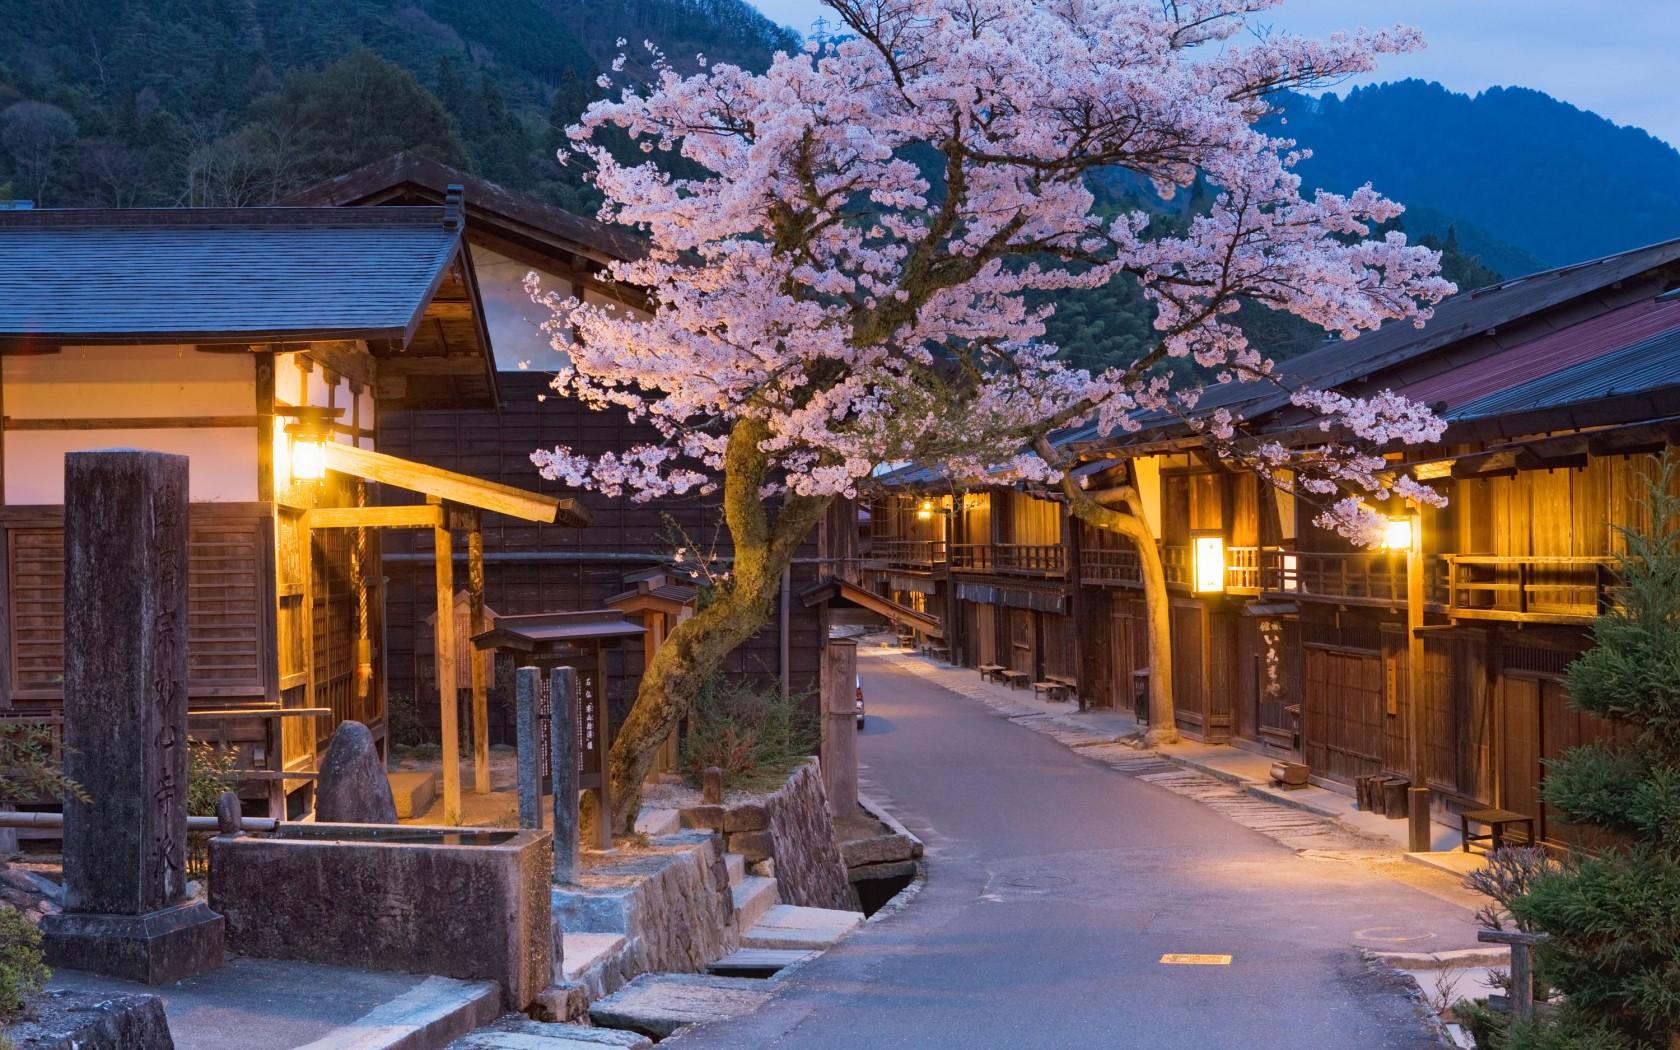 The Kiso Valley